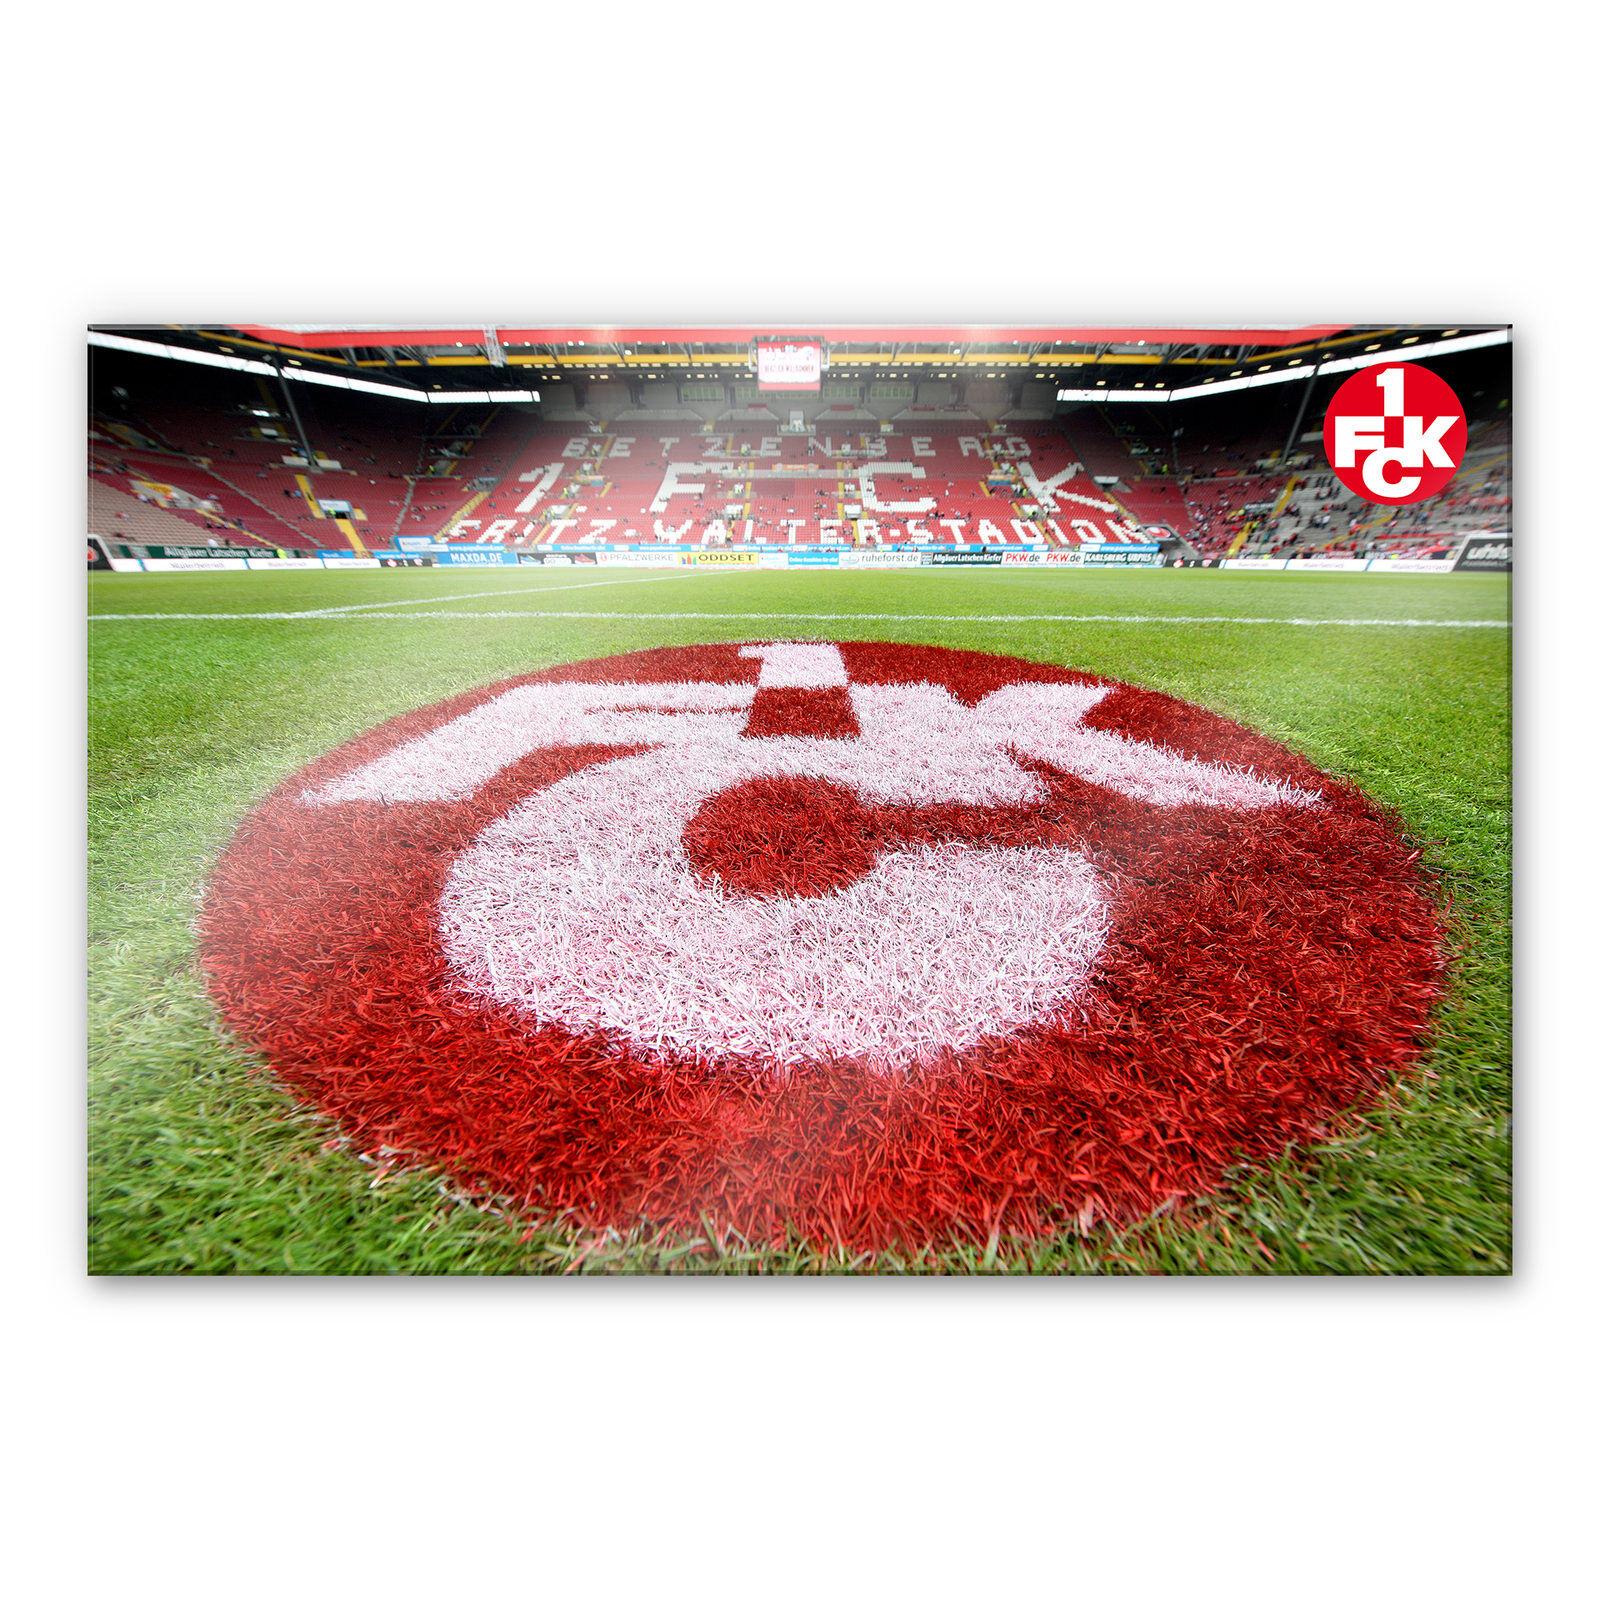 Acrylglasbild 1. FC Kaiserslautern - Rasen Logo bunt WANDBILD DEKO BILD FANSHOP